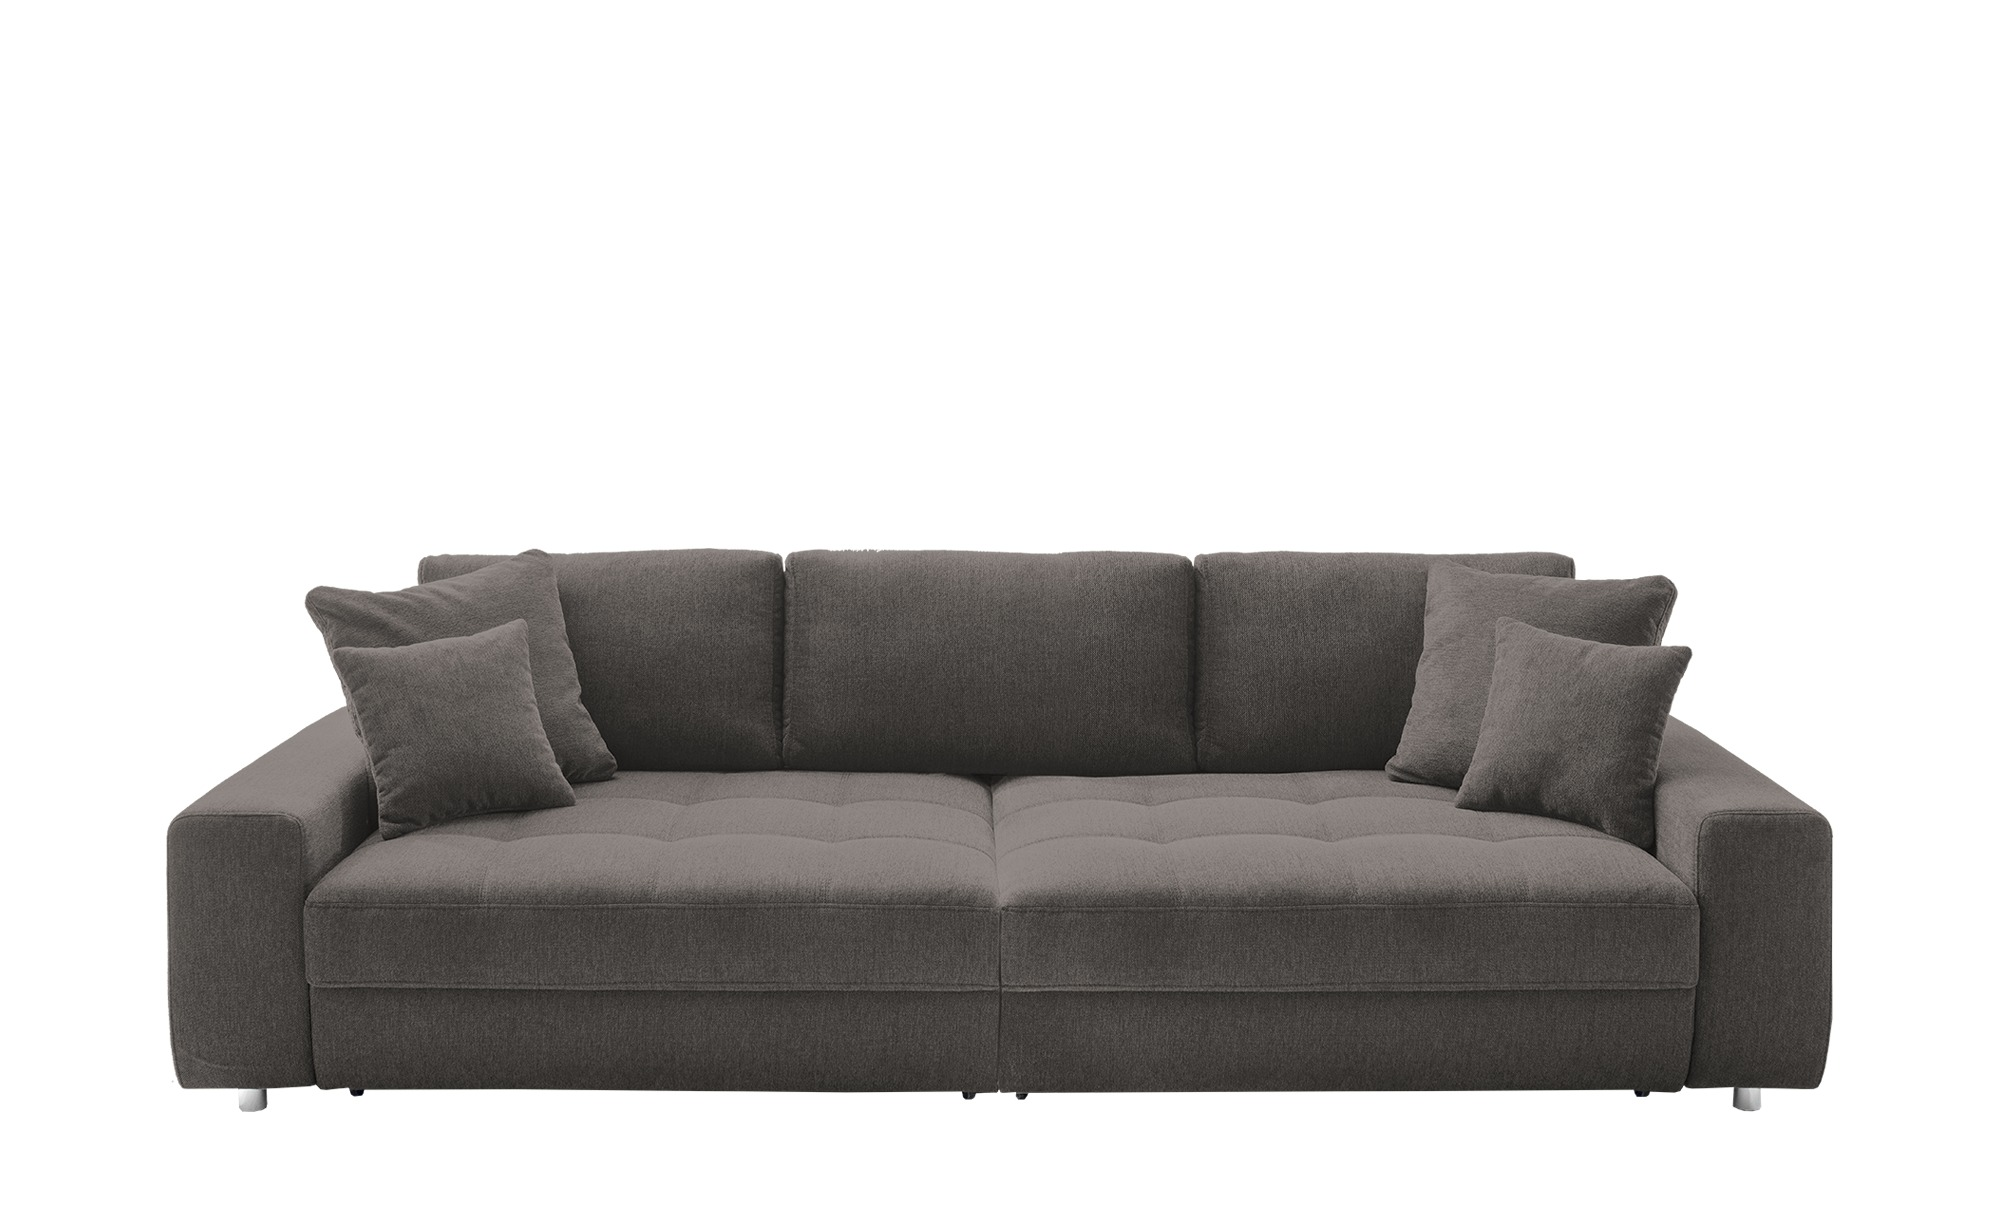 bobb Big Sofa  Arissa de Luxe ¦ braun ¦ Maße (cm): B: 292 H: 84 T: 120 Polstermöbel > Sofas > Big-Sofas - Höffner